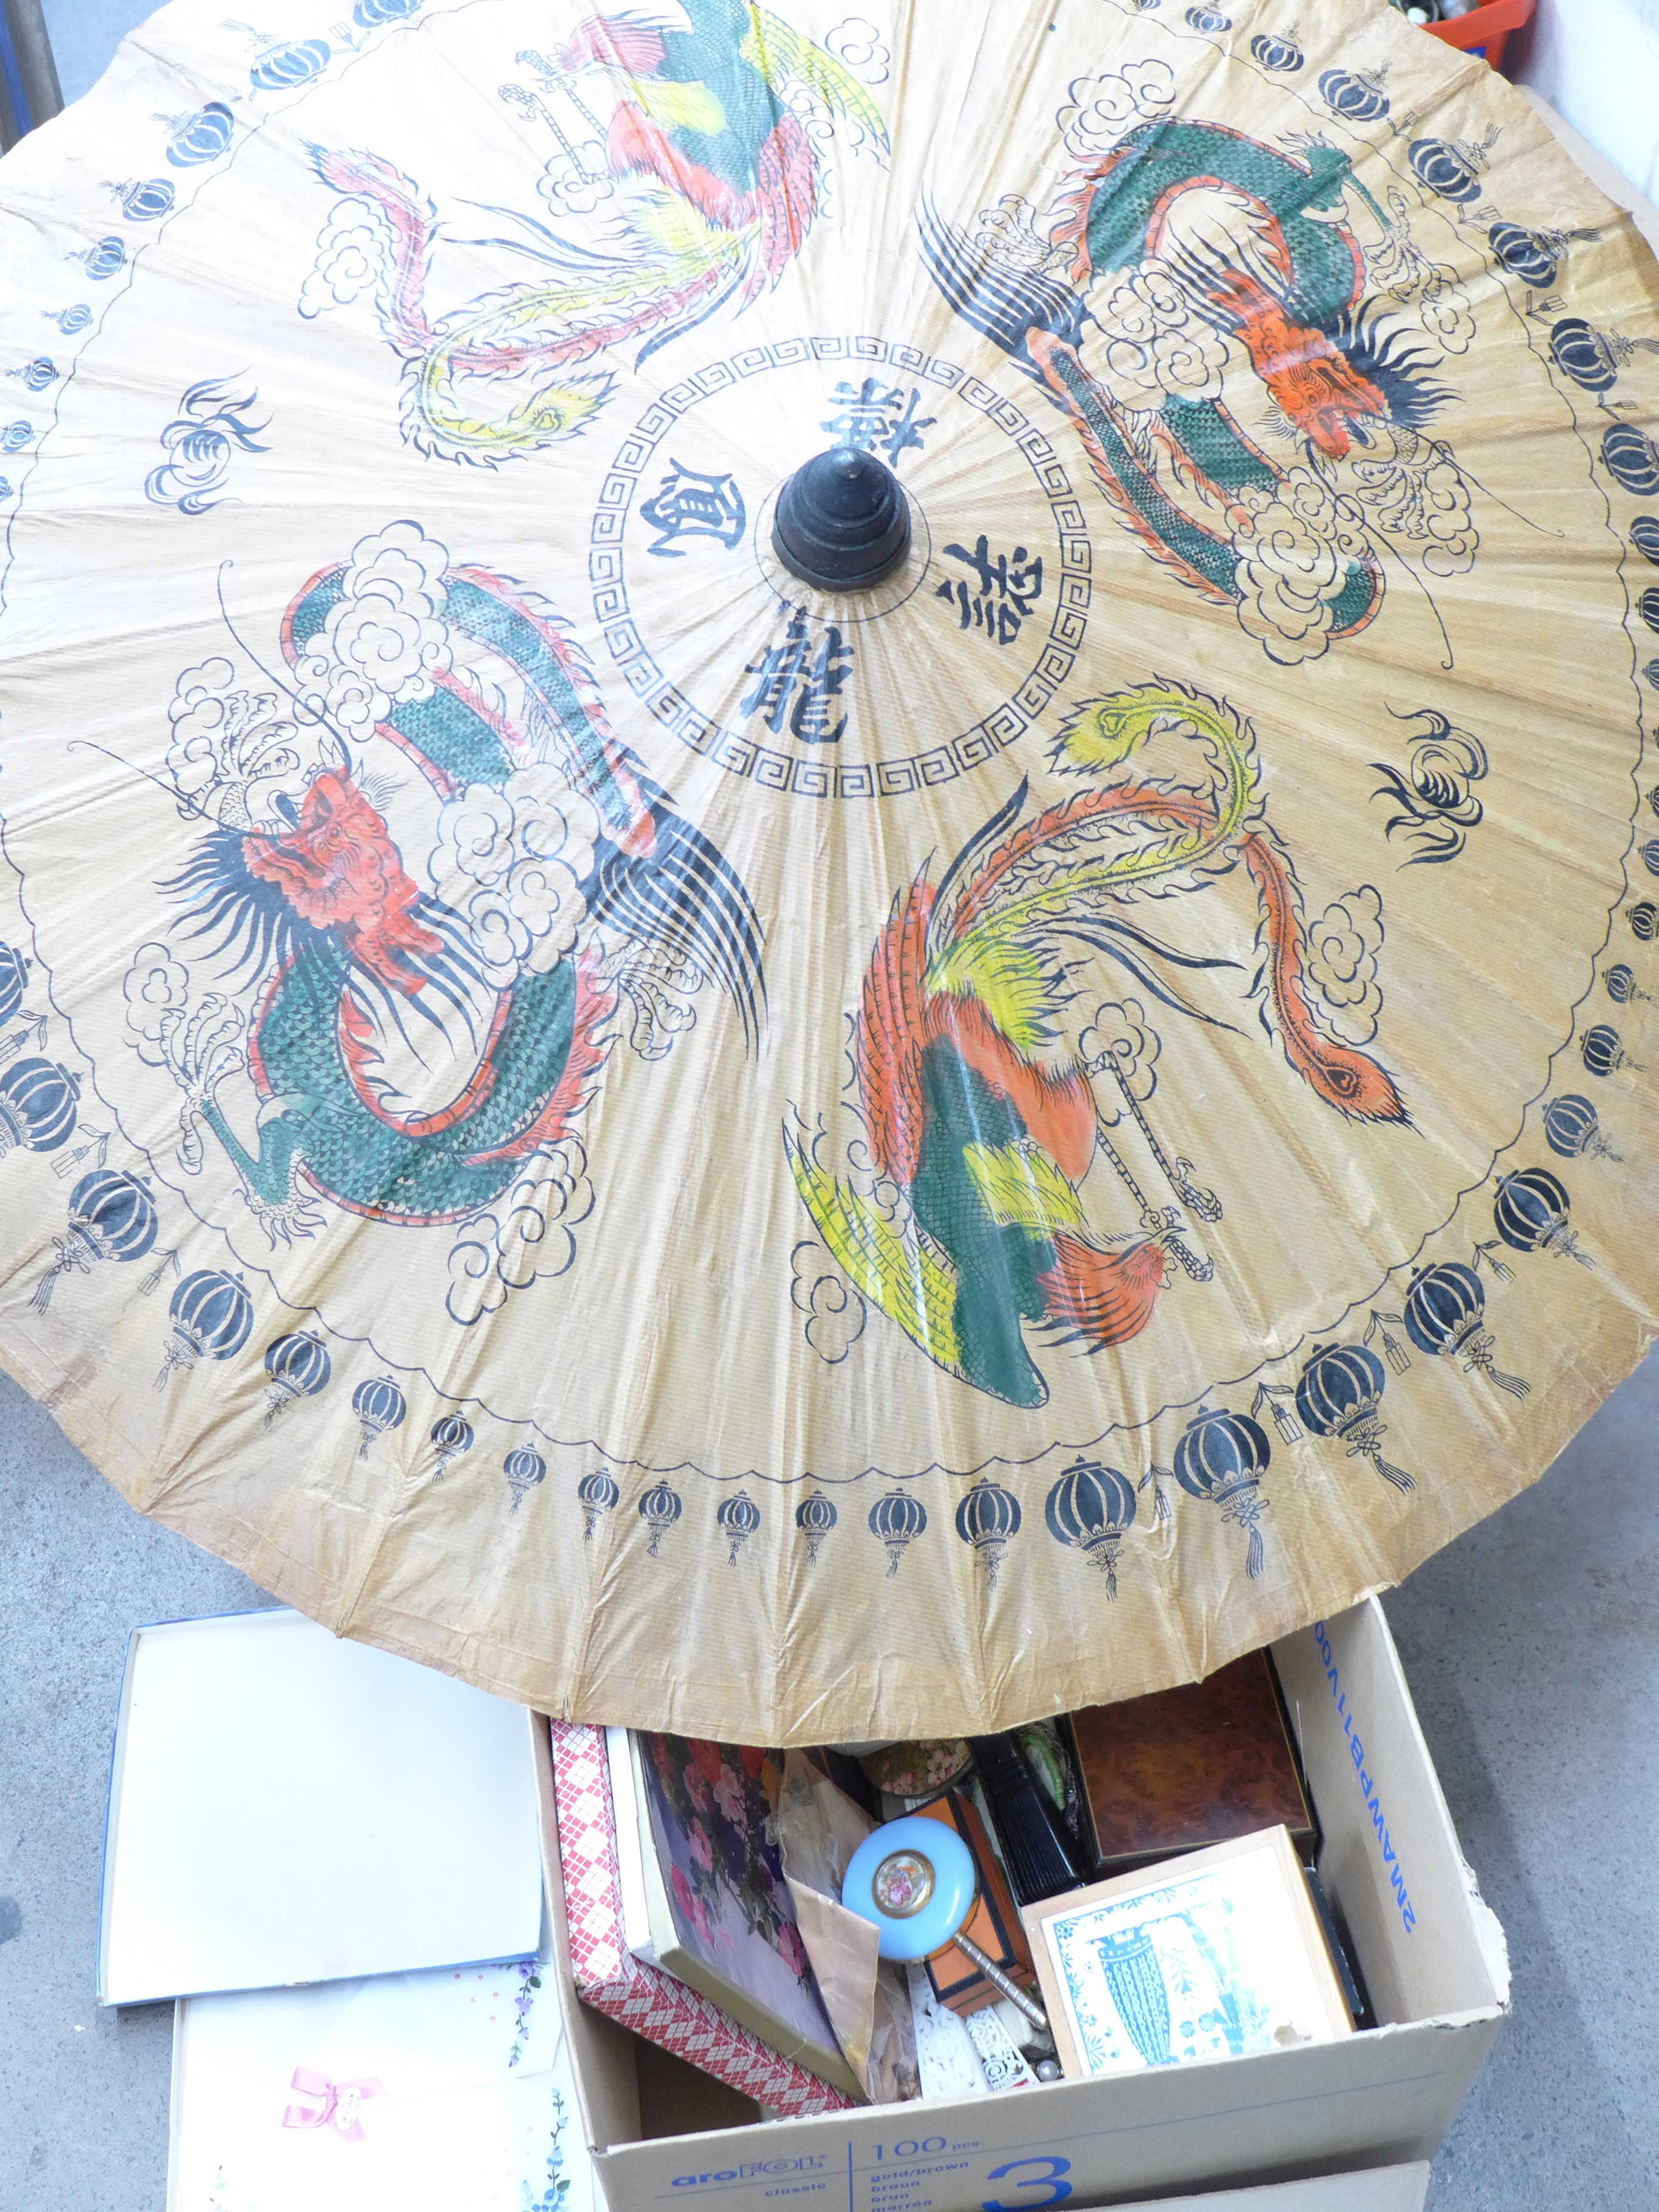 Lot 700 - Costume jewellery, parasol, fans, hand mirrors, boxed handkerchiefs, small glass animals, etc.